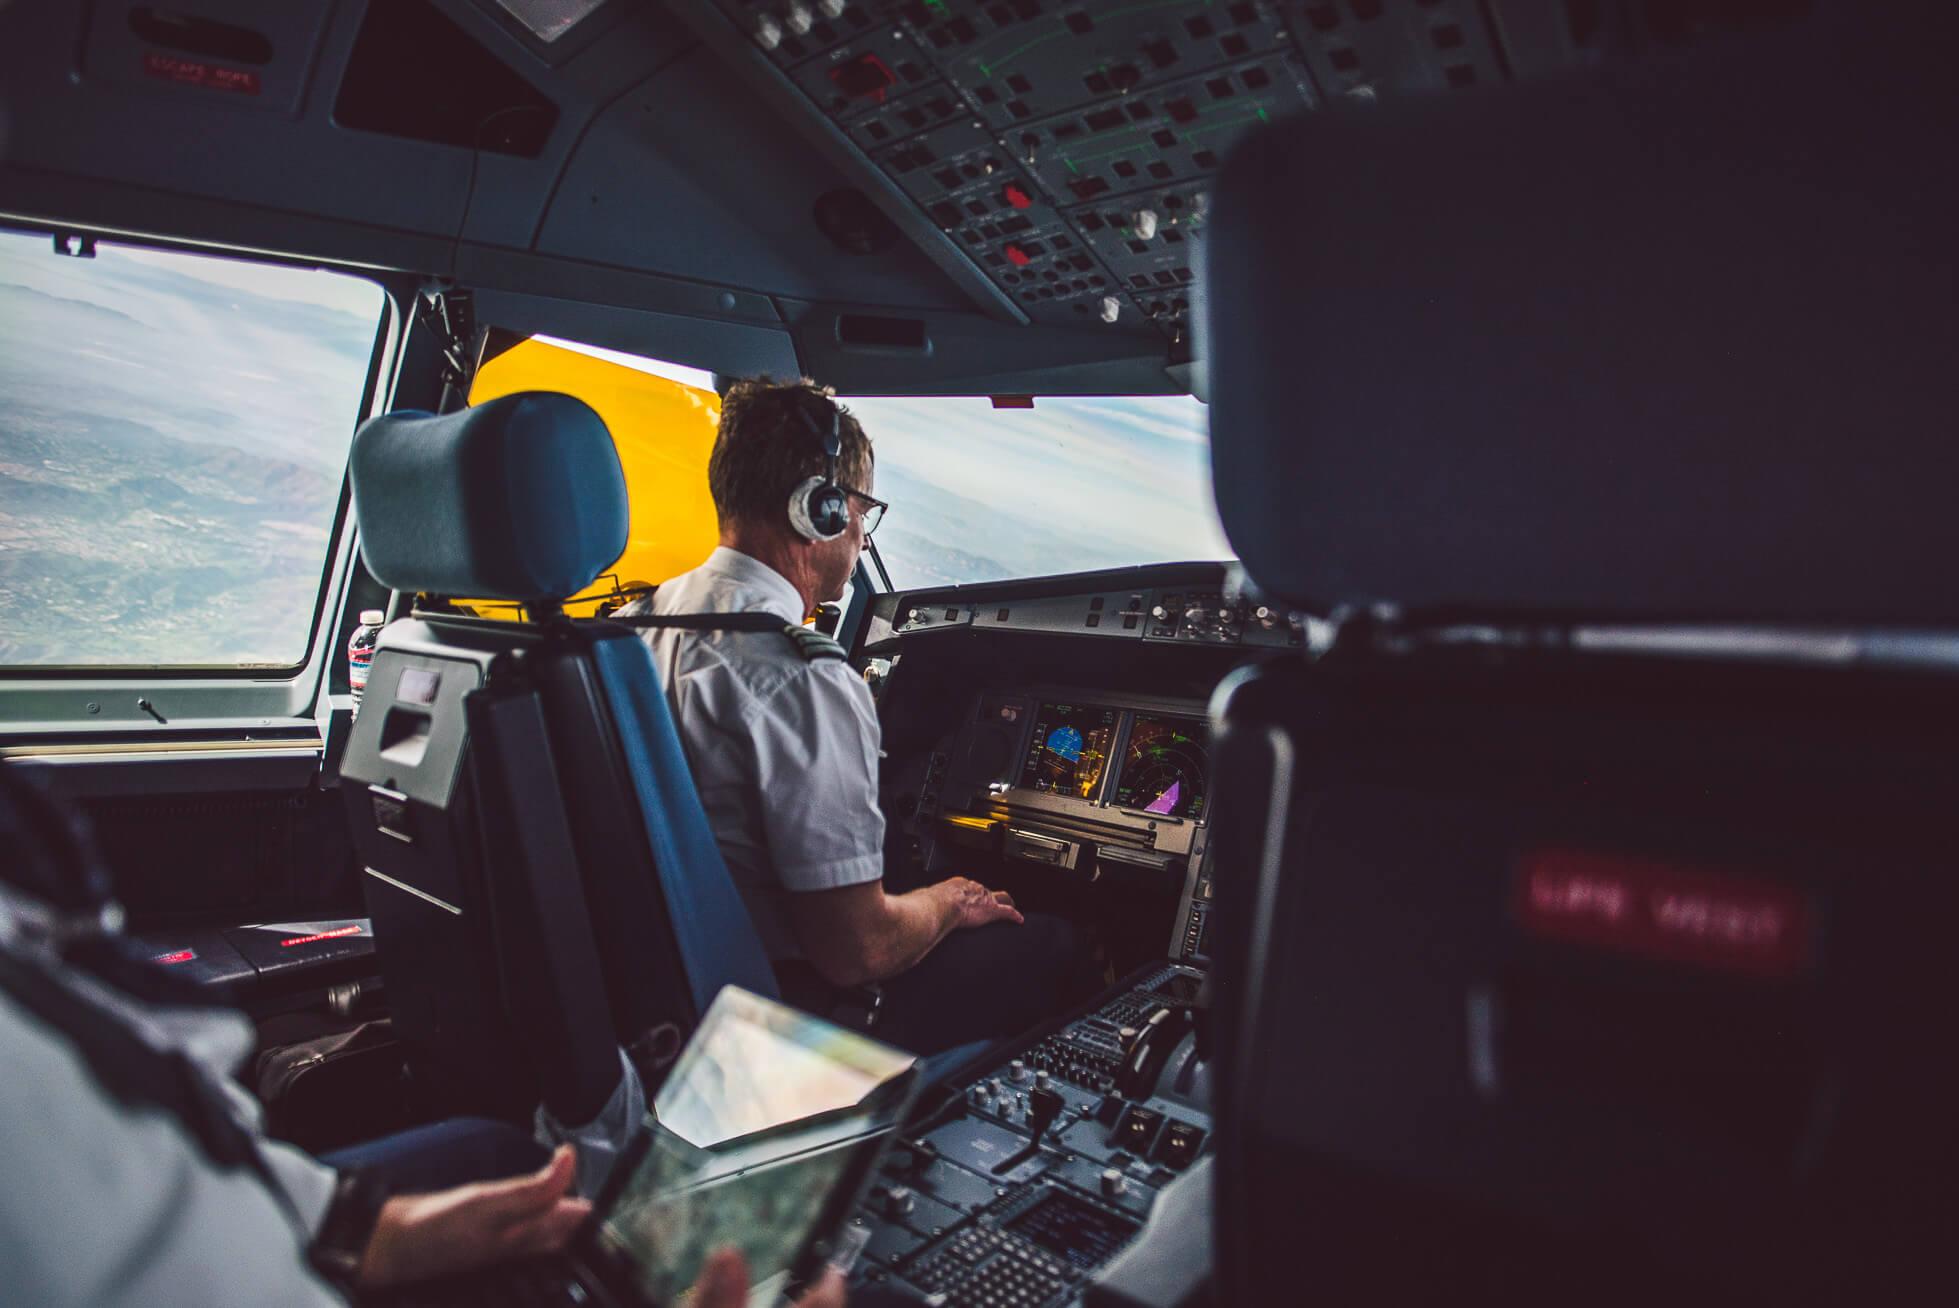 janni-deler-flight-mode-sasDSC_1554